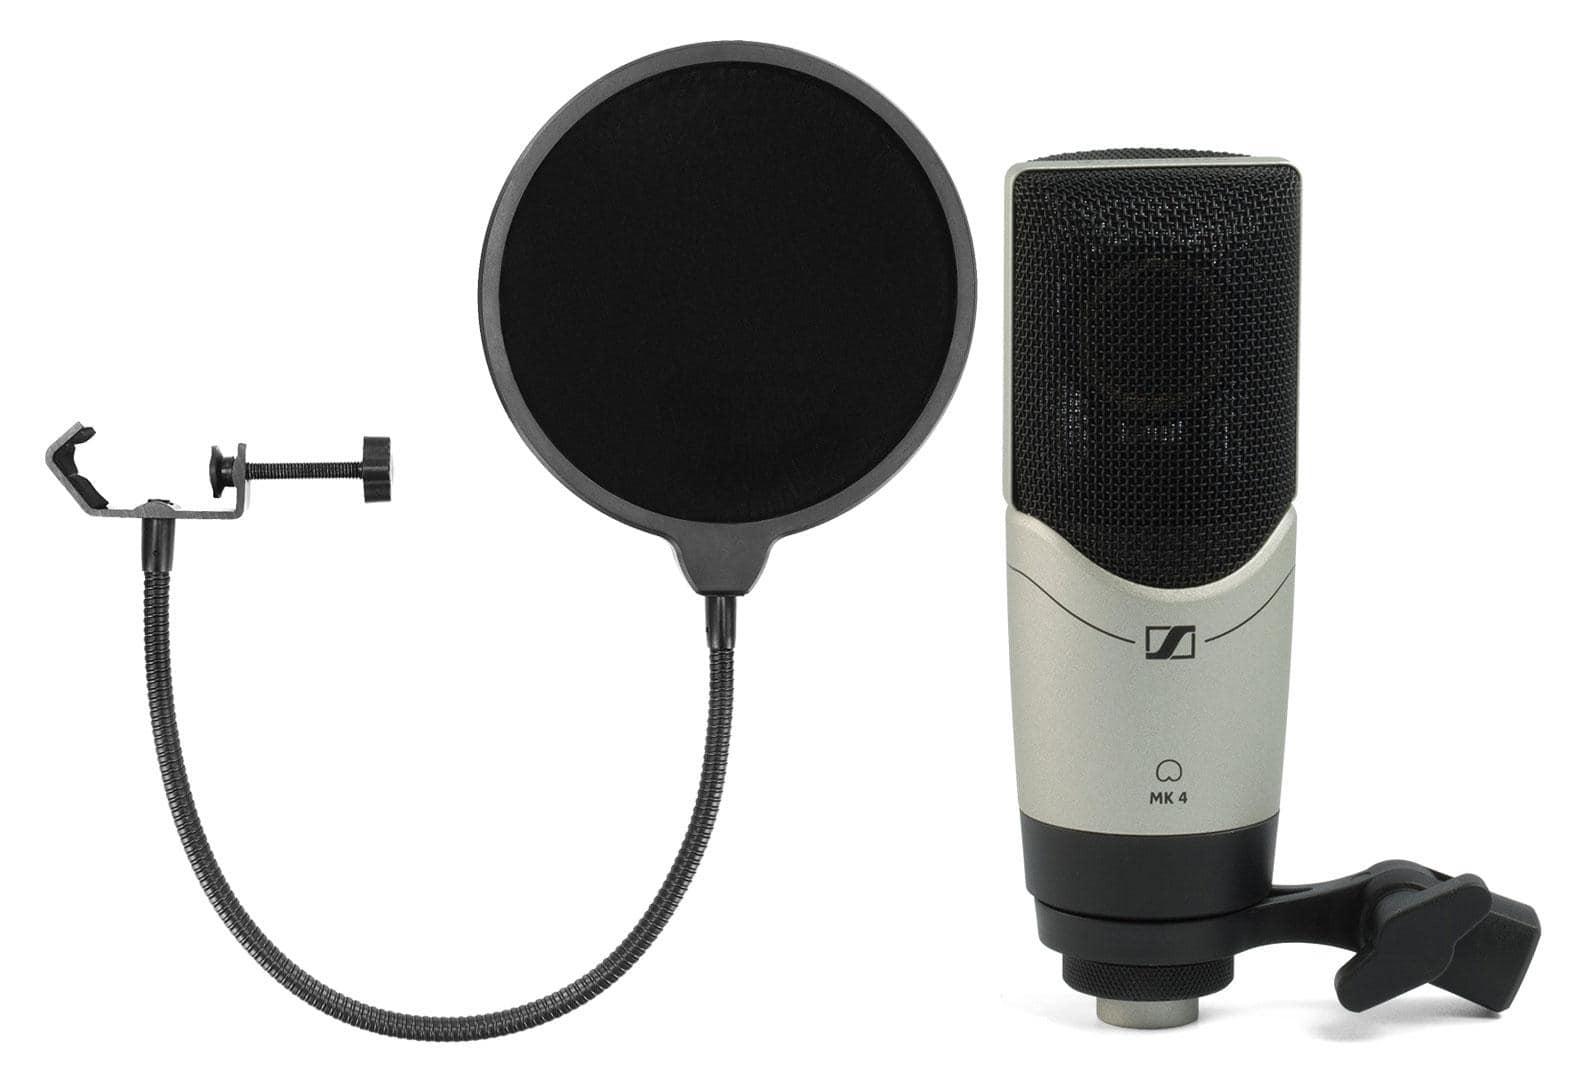 Mikrofone - Sennheiser MK4 Kondensatormikrofon Set inkl. Popkiller - Onlineshop Musikhaus Kirstein